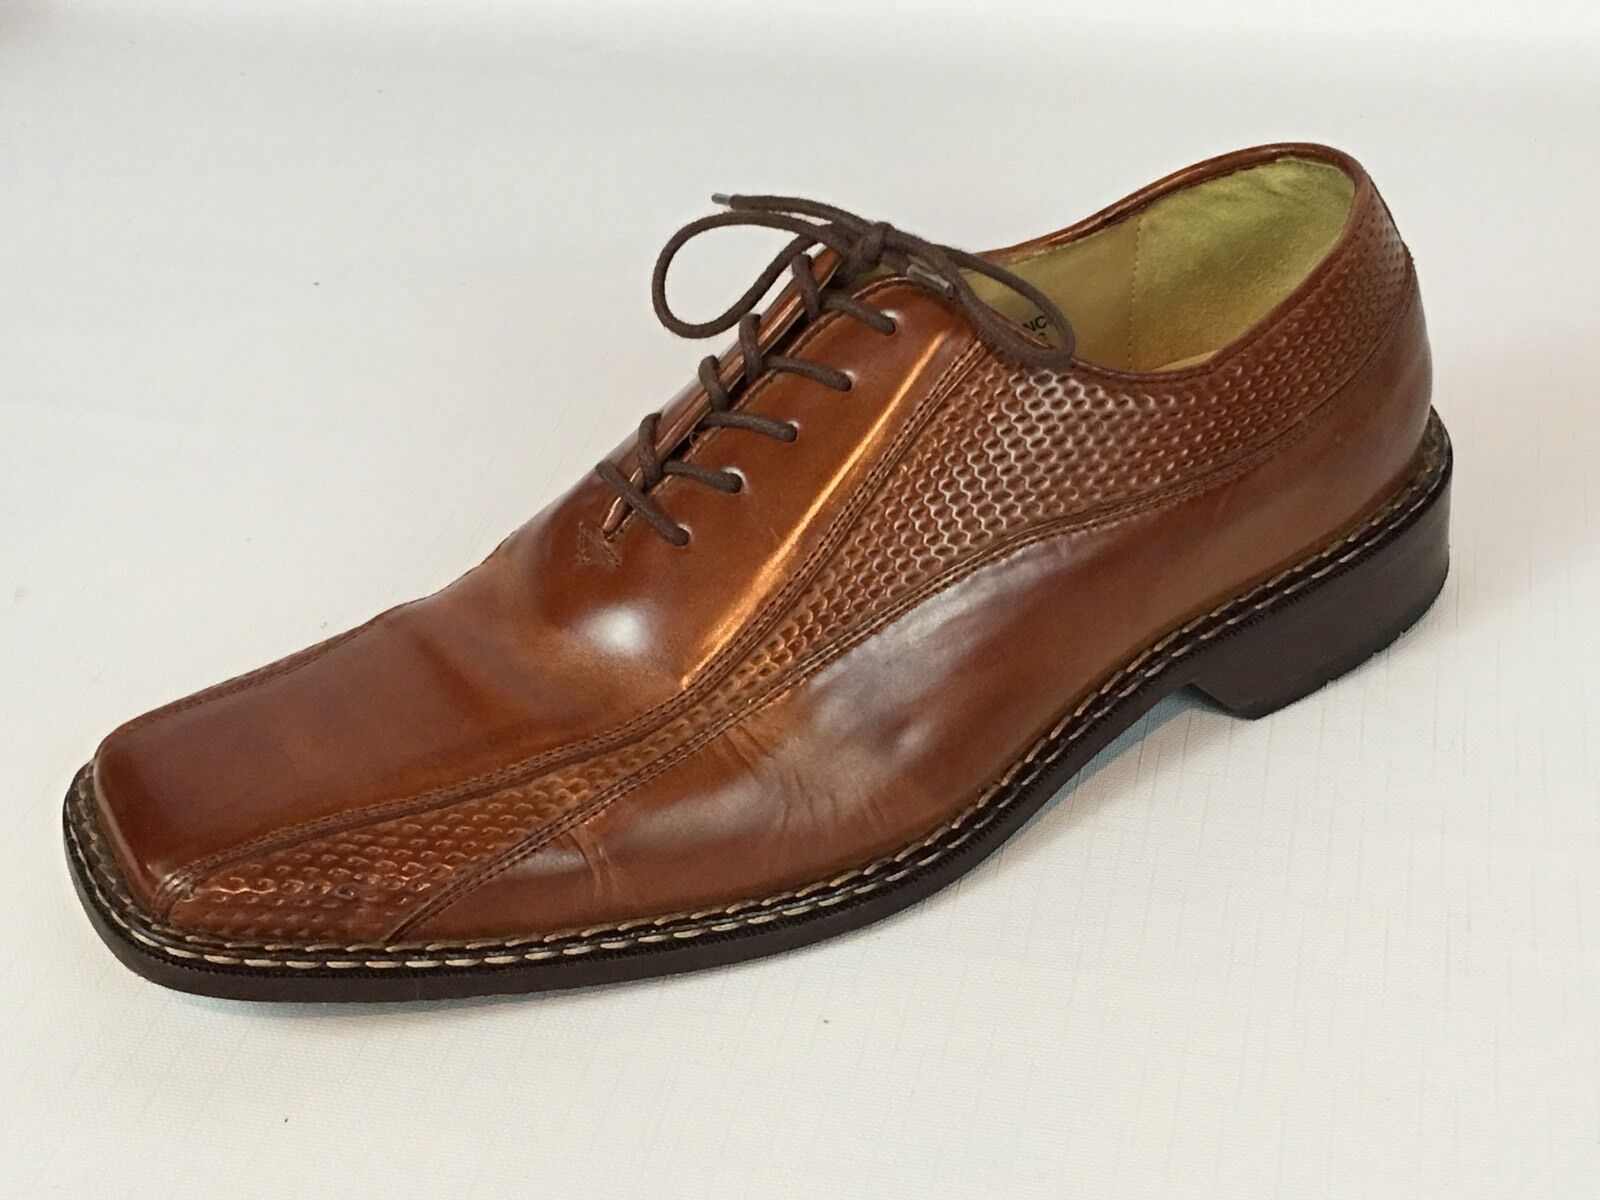 Men's STACY ADAMS Fancy Brown Leather Oxford Dress shoes 13M - Brazil - NICE